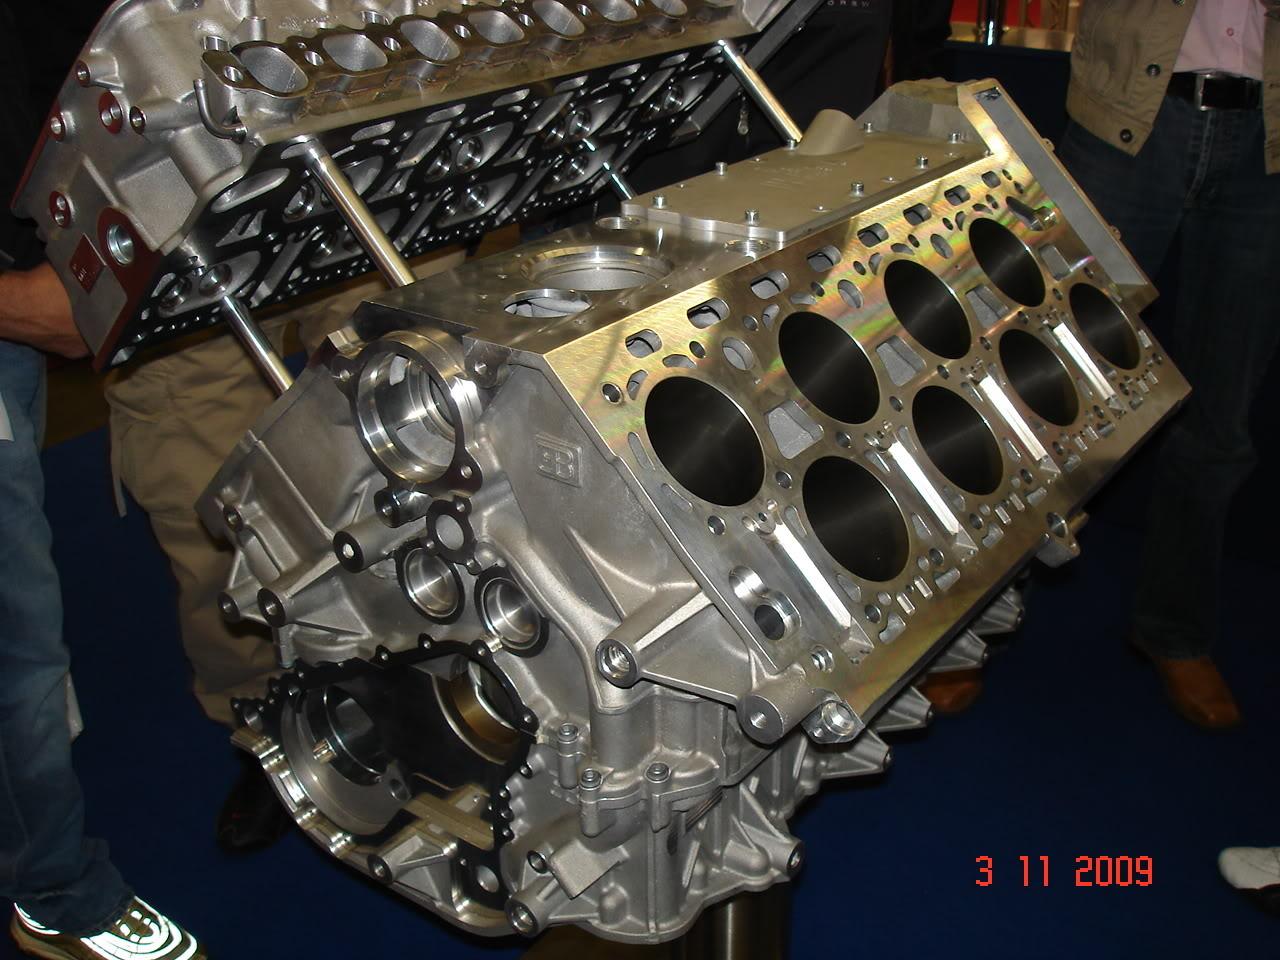 veyron w16 engine diagram 7 2 depo aqua de \u2022w16 engine piston diagram wiring schematic diagram rh 63 twizer co bugatti w16 engine lego veyron w16 engine